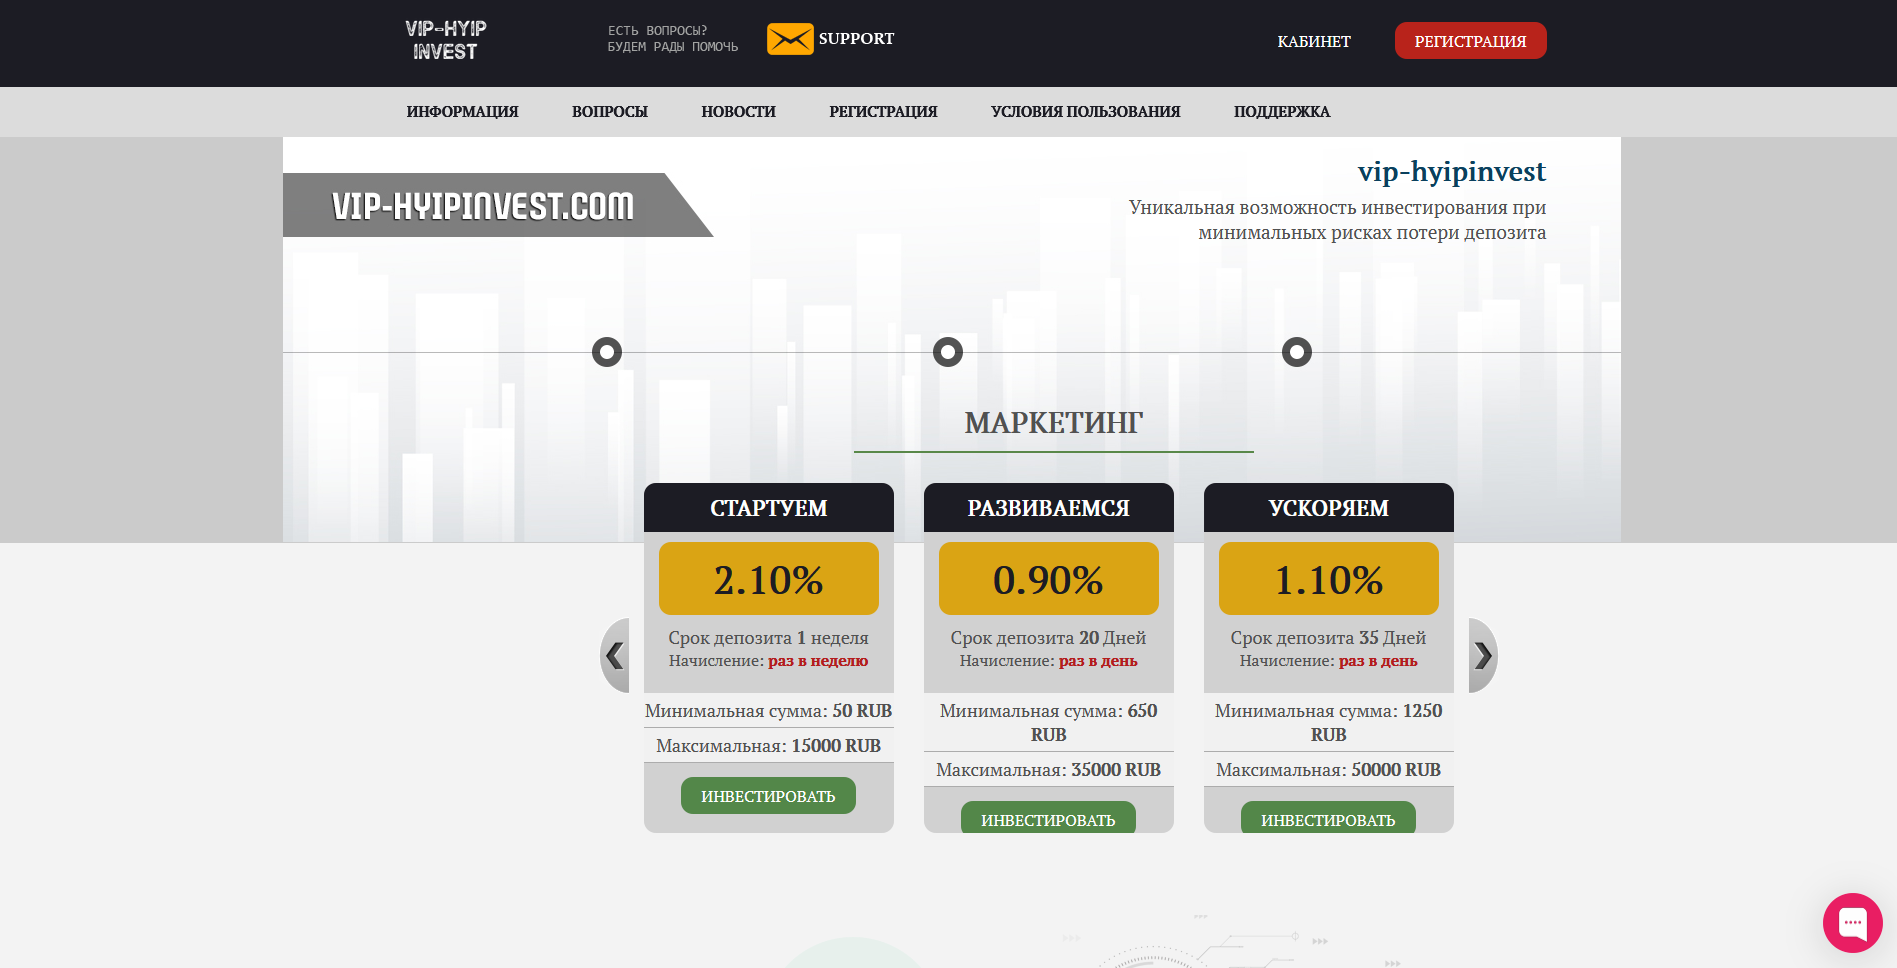 Vip-hyipinvest 2NL8WLot